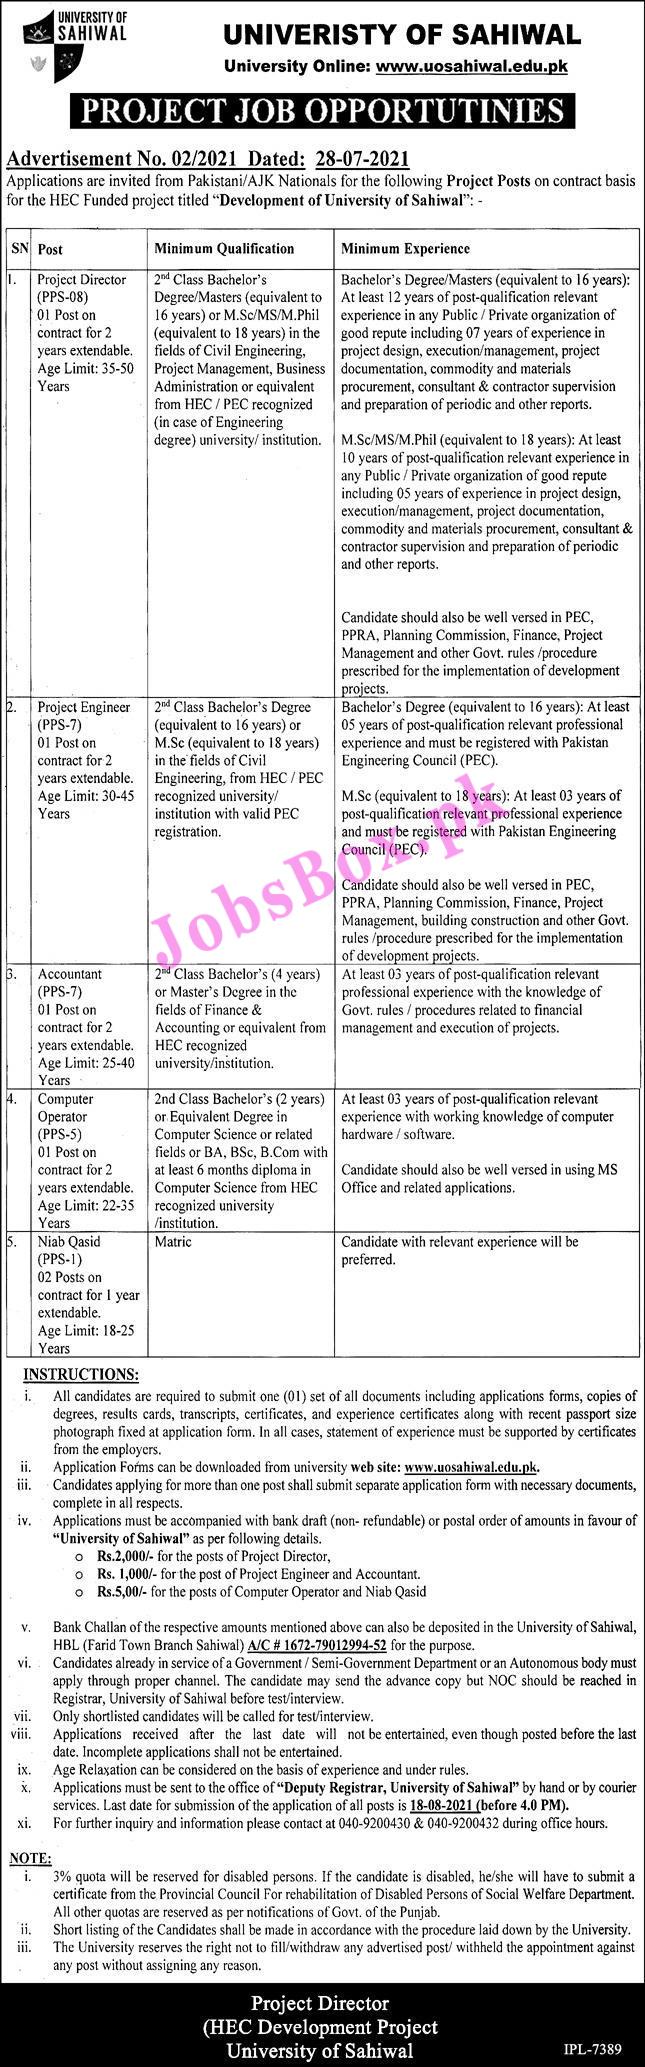 www.uosahiwal.edu.pk Jobs 2021 - University of Sahiwal Jobs 2021 in Pakistan